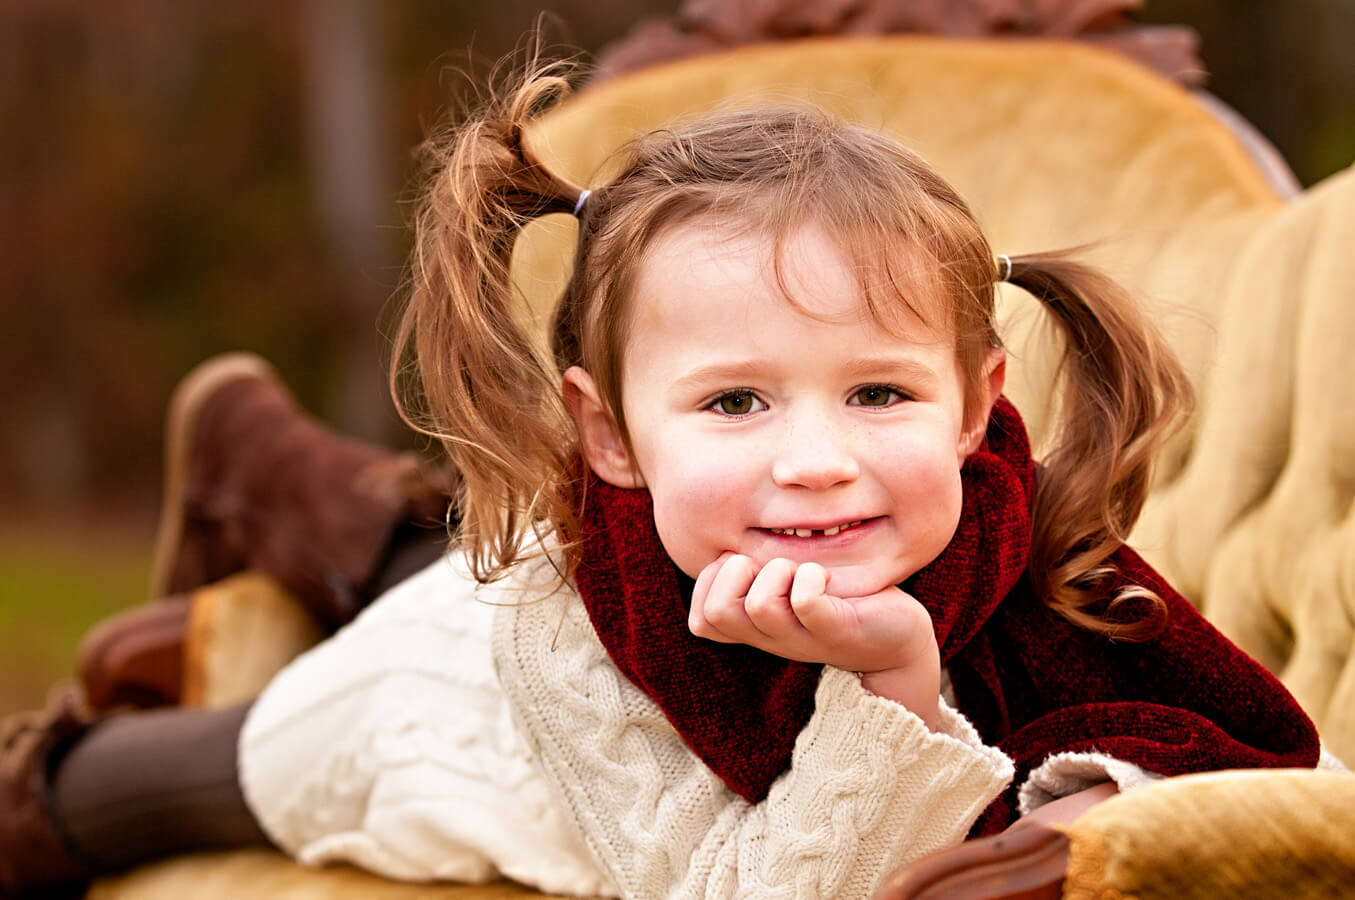 child, portrait, sofa, outdoor, natural light, Northern VA